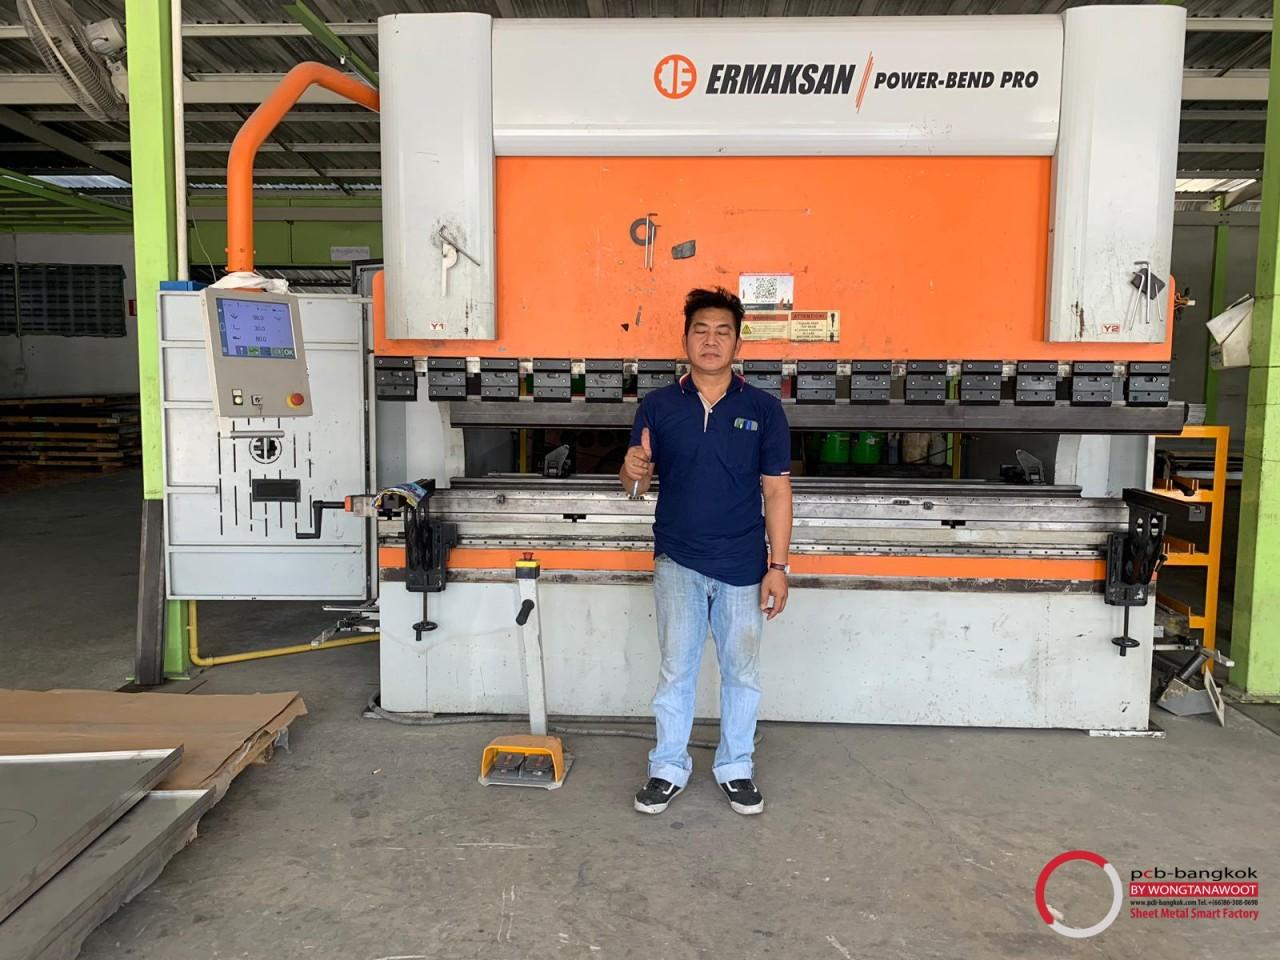 Wongtanawoot___press-brake_ermaksan_1